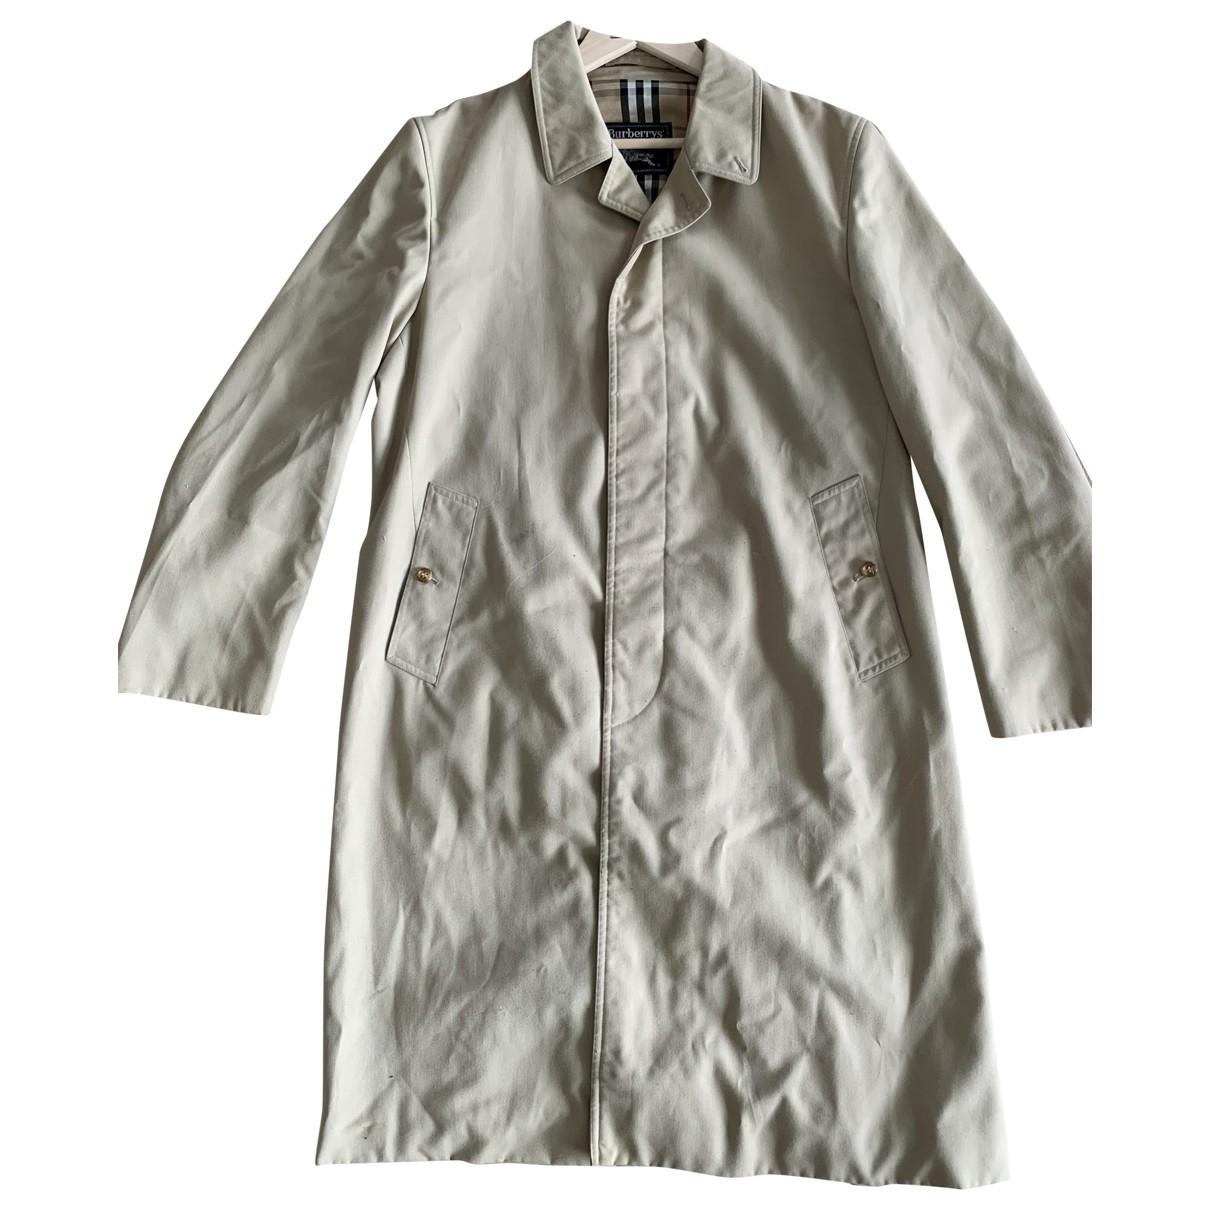 Burberry \N Beige Cotton coat  for Men XL International